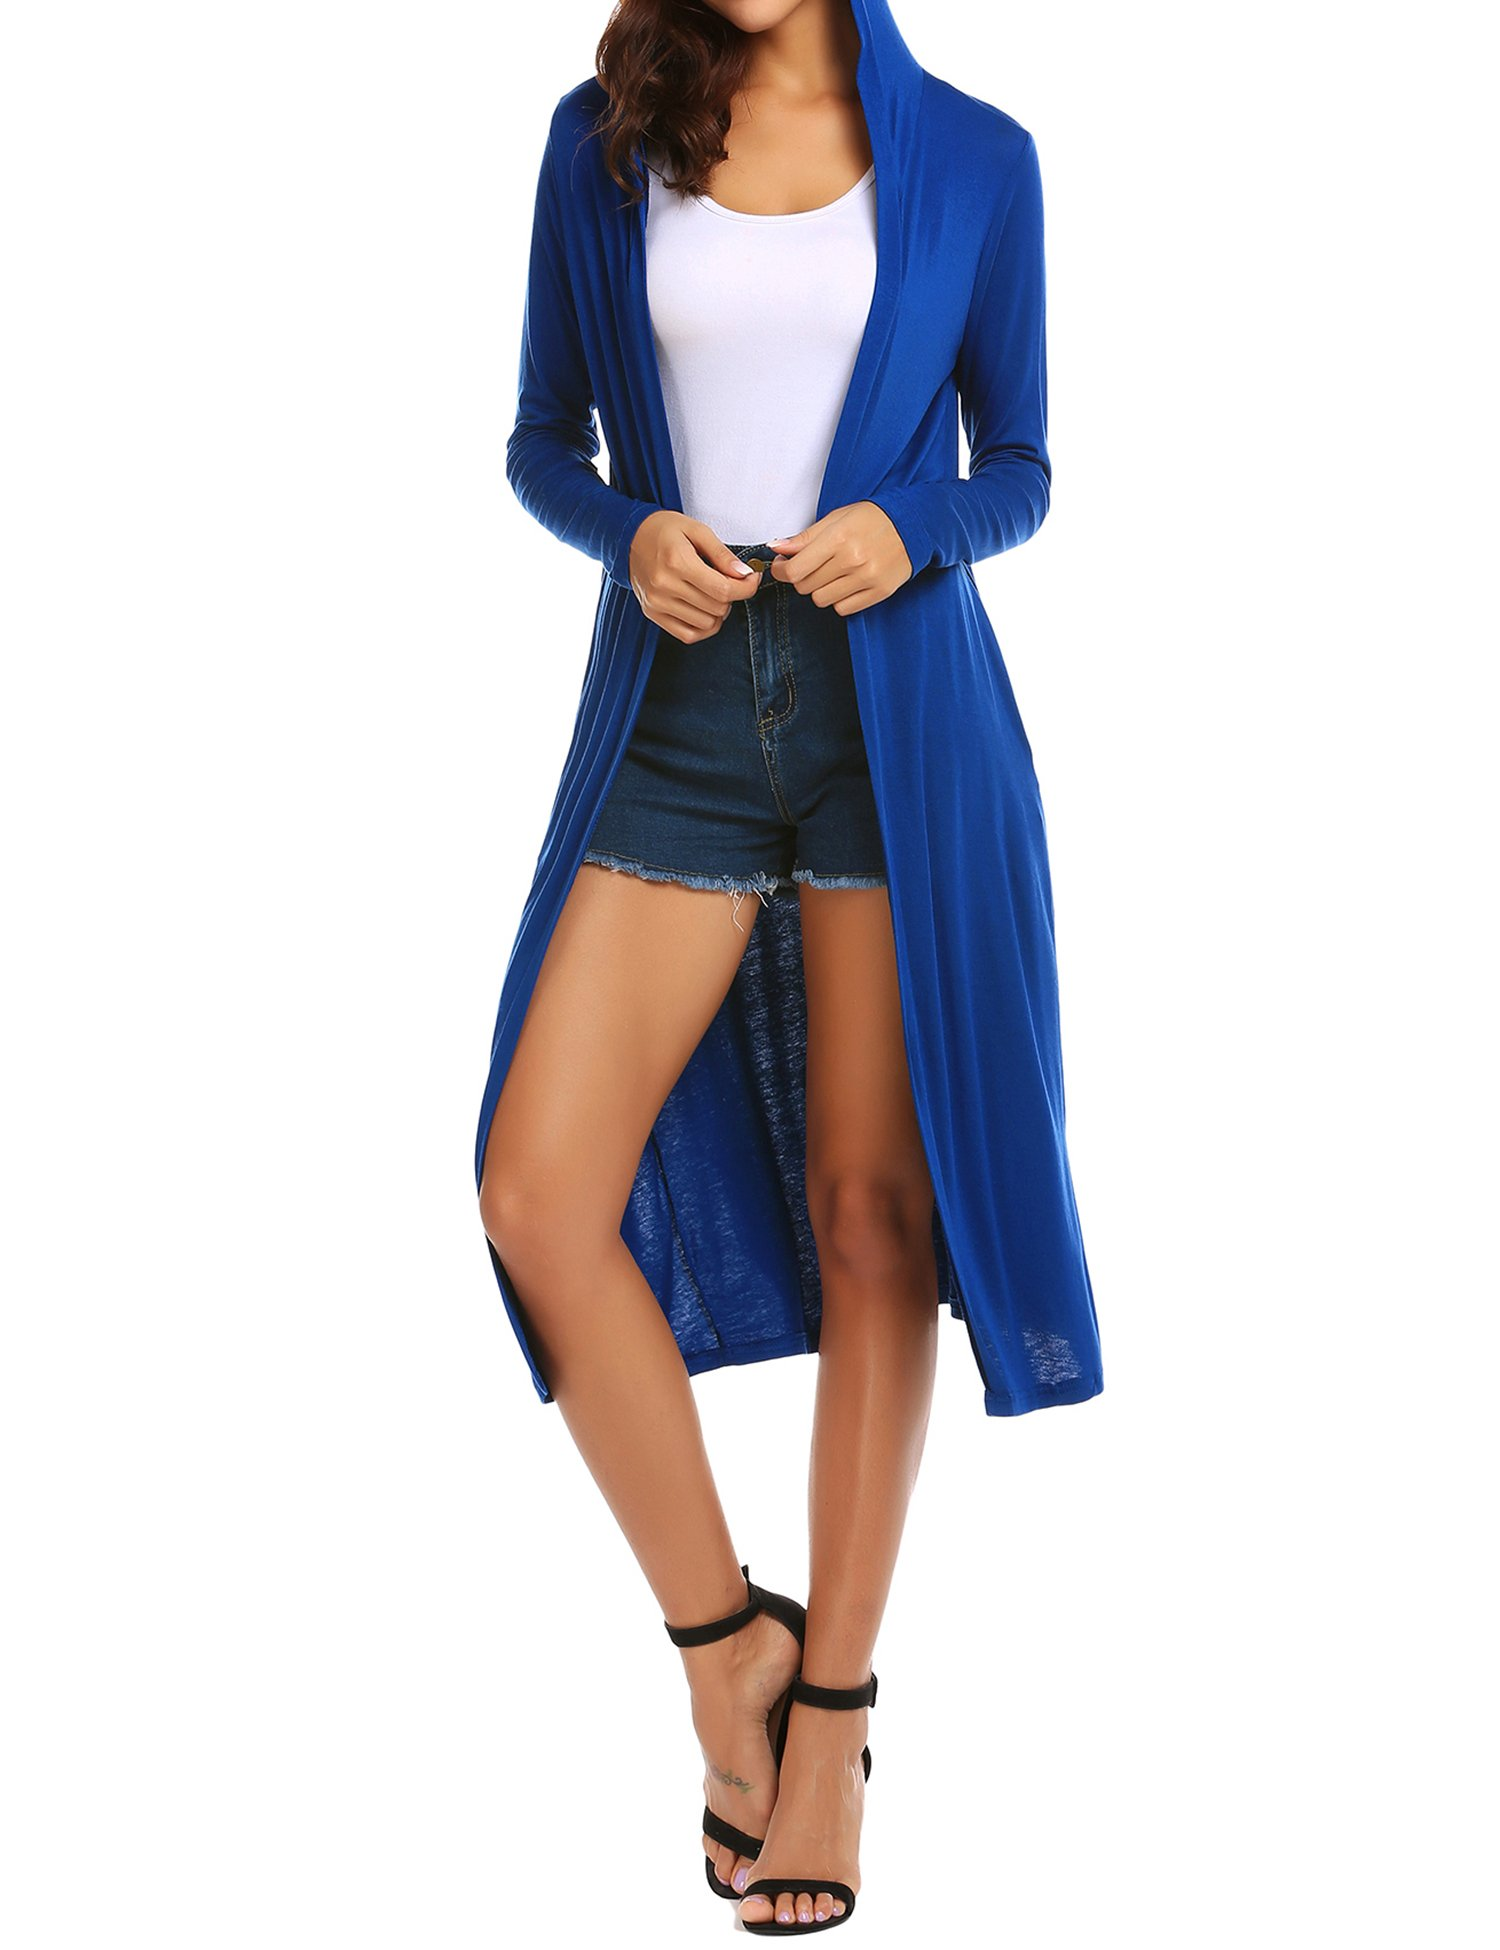 Beyove Women s Long Sleeve Waterfall Hoodies Open Front Maxi Cardigan  Sweater Navy Blue M ac30ae4da